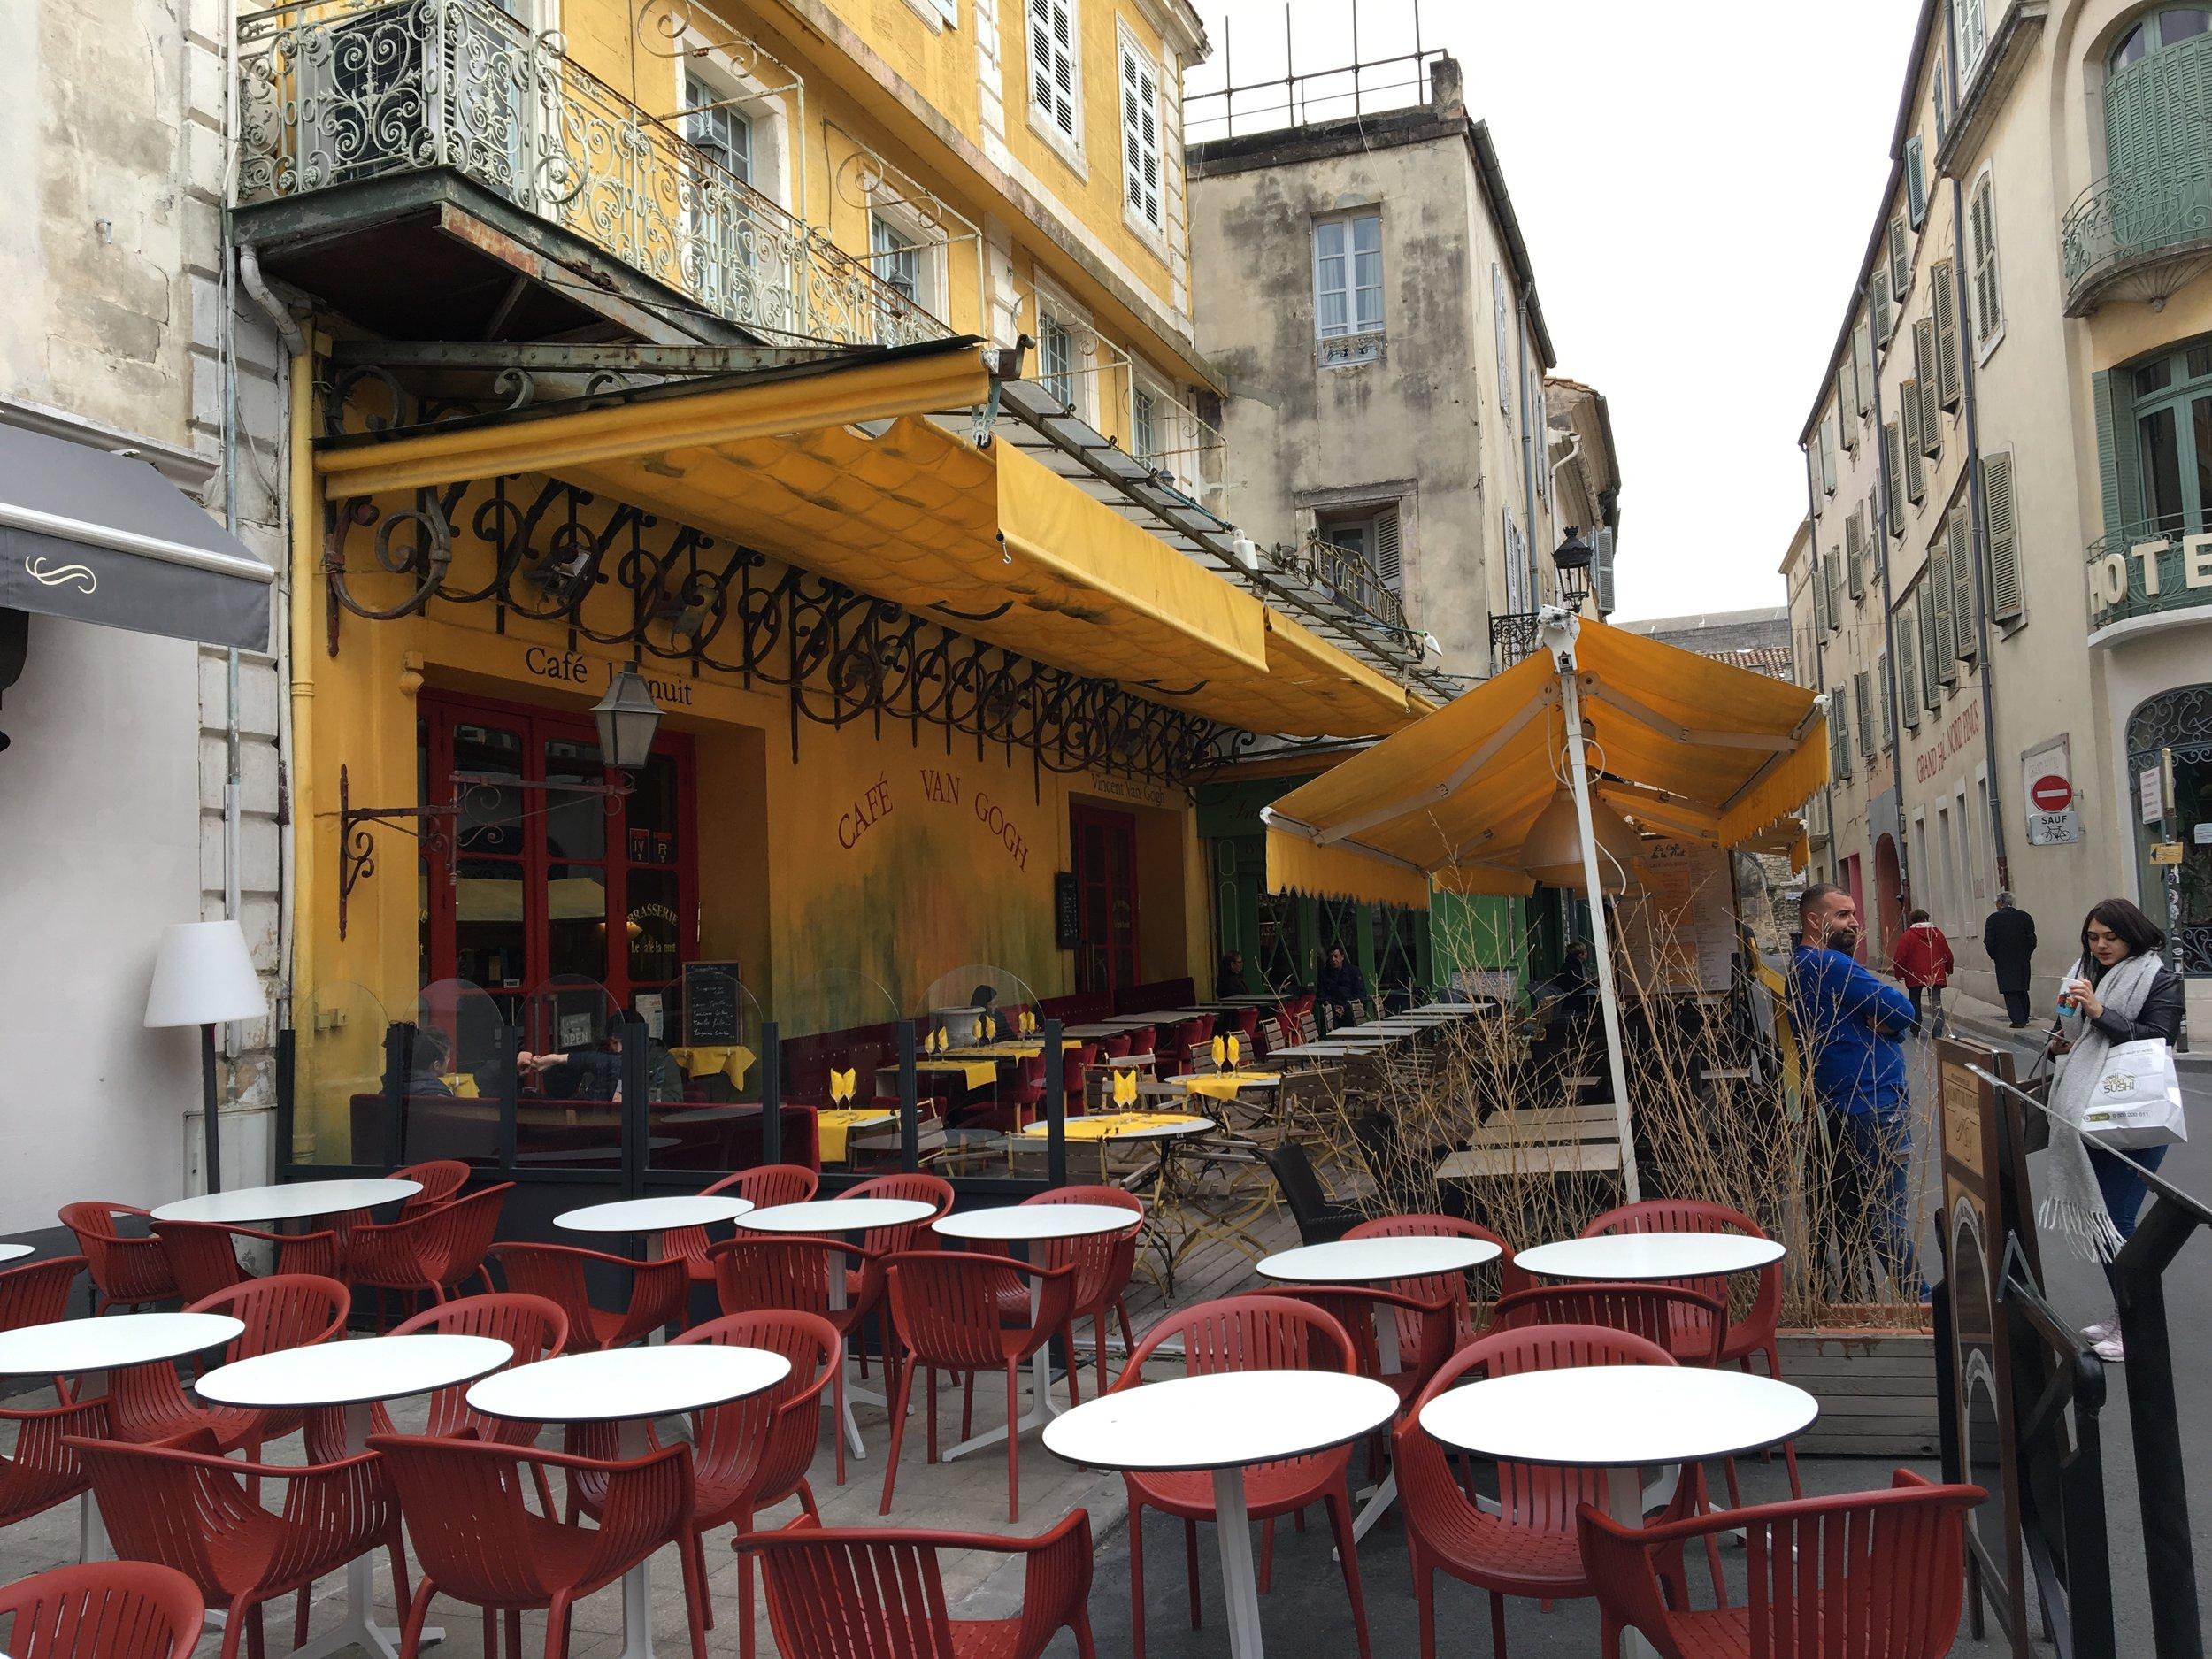 Cafe Van Gogh. Photo by Ranger Holly.